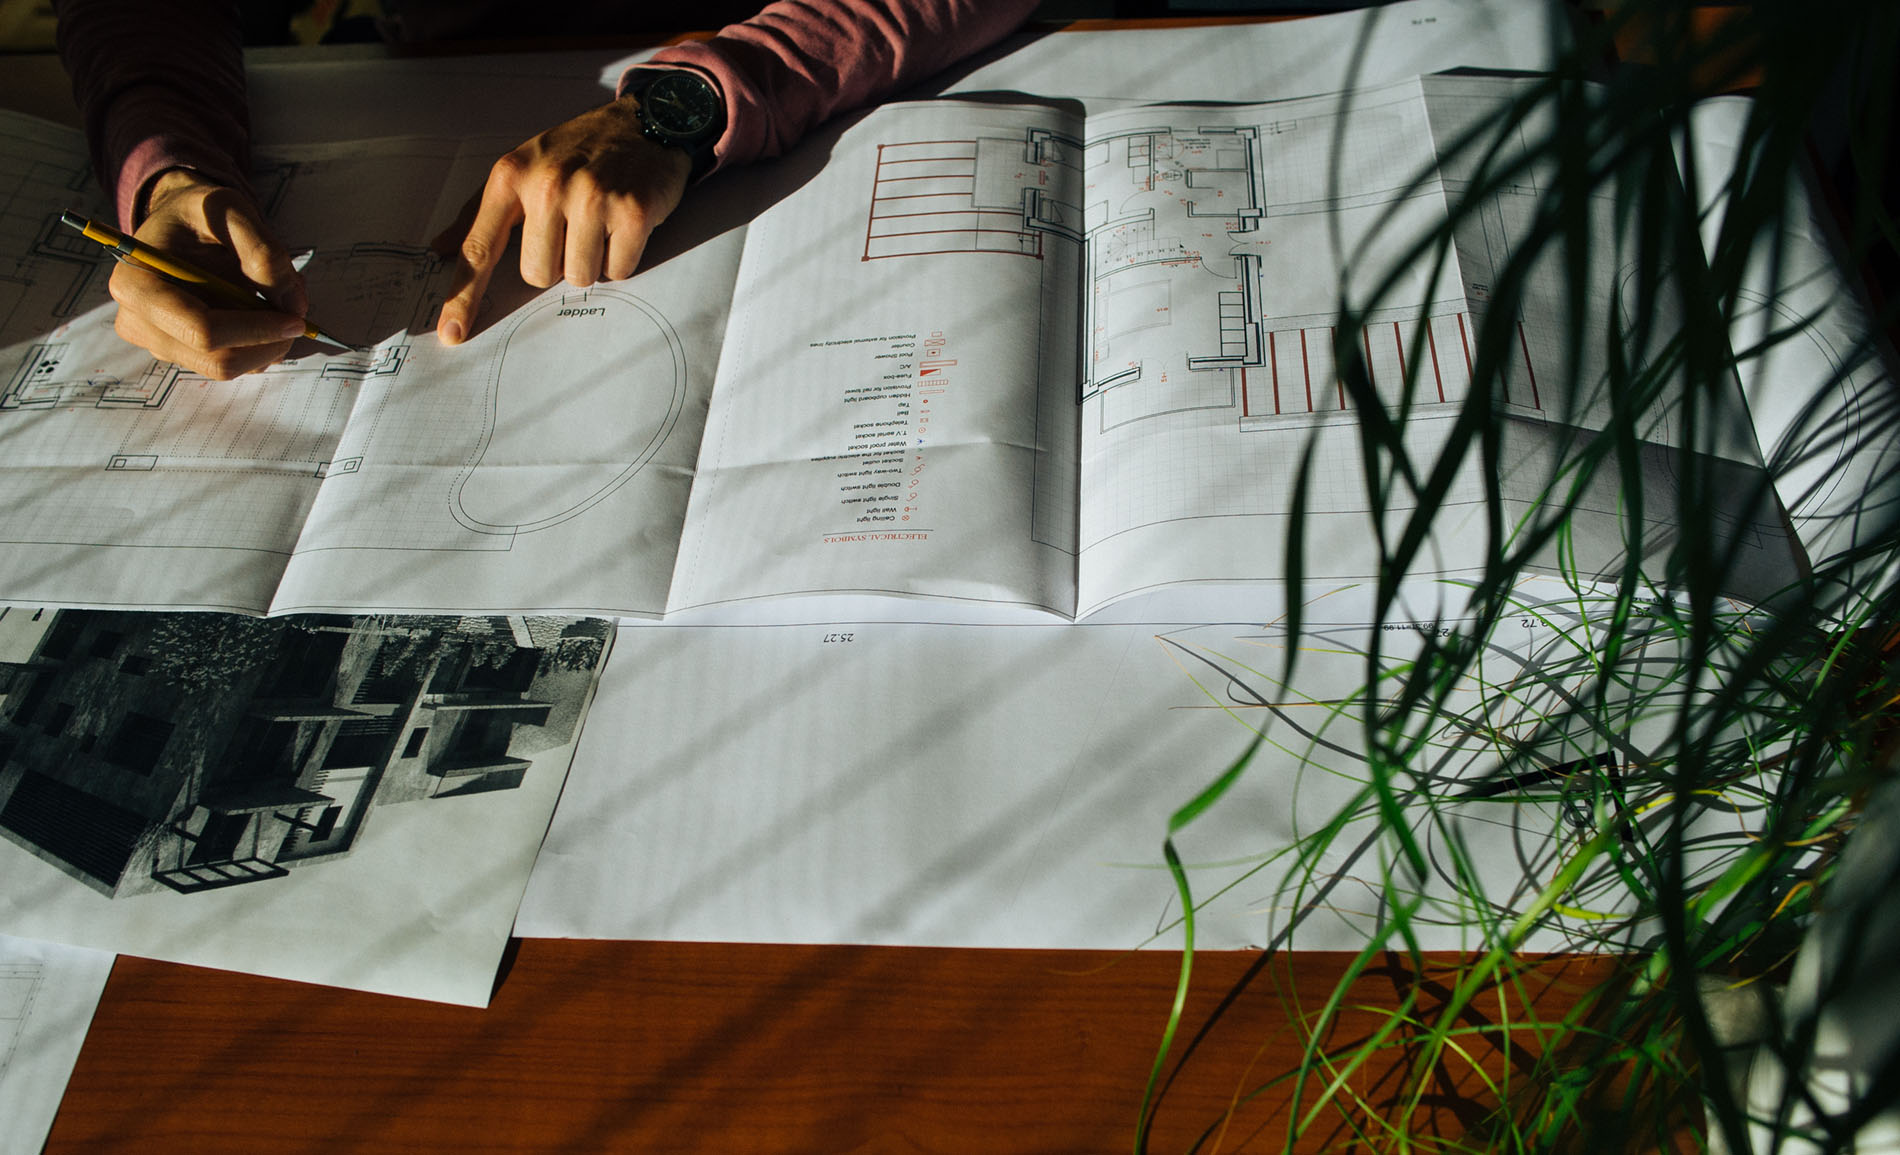 Design and Architecture Department